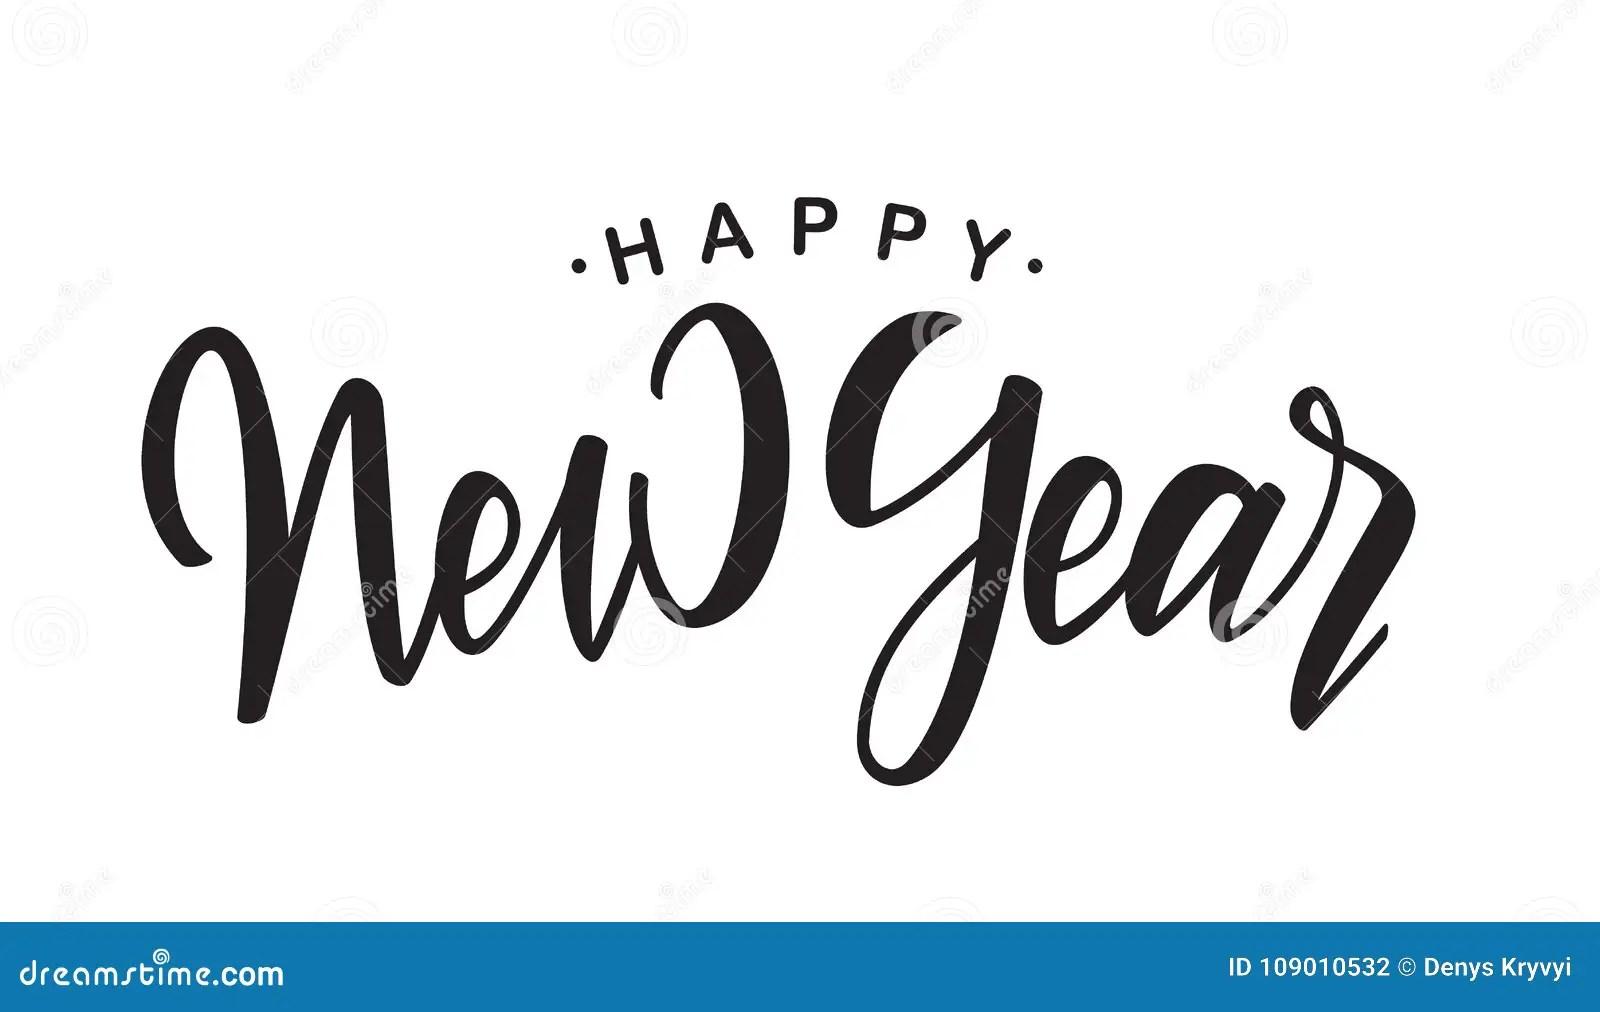 Handwritten Elegant Brush Lettering Of Happy New Year On